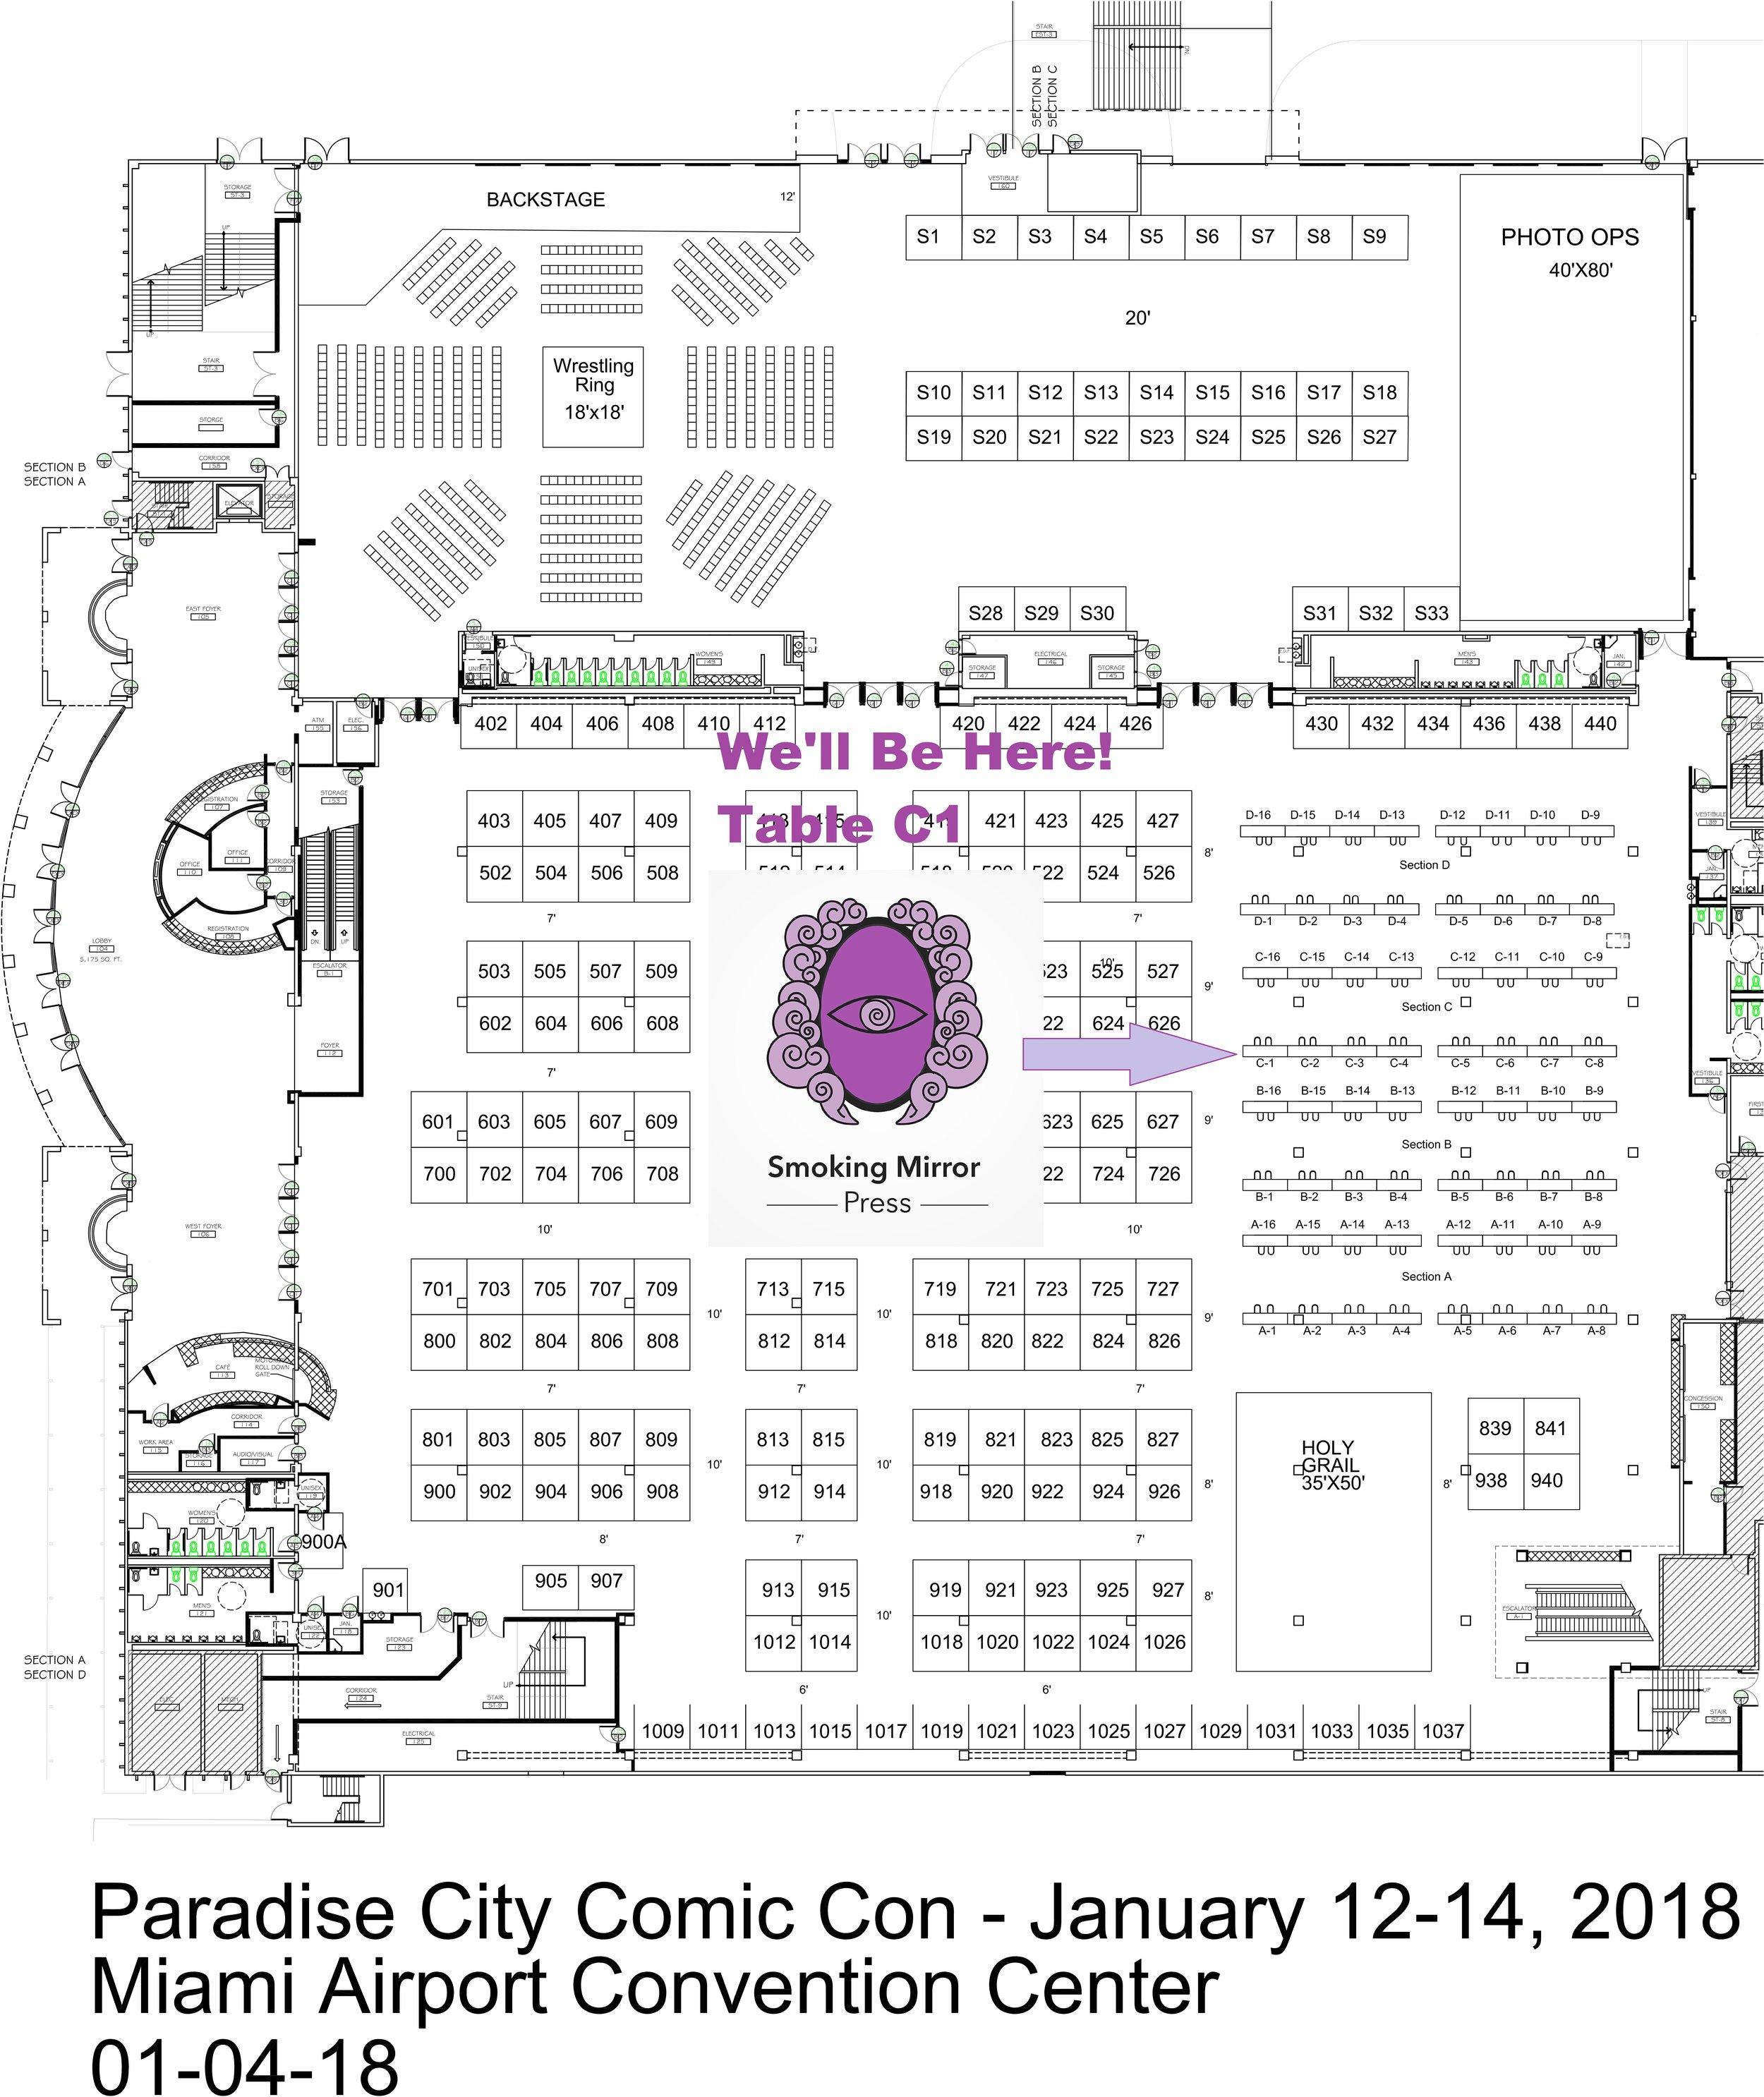 PCCC-2018-Floorplan-jpg.jpg